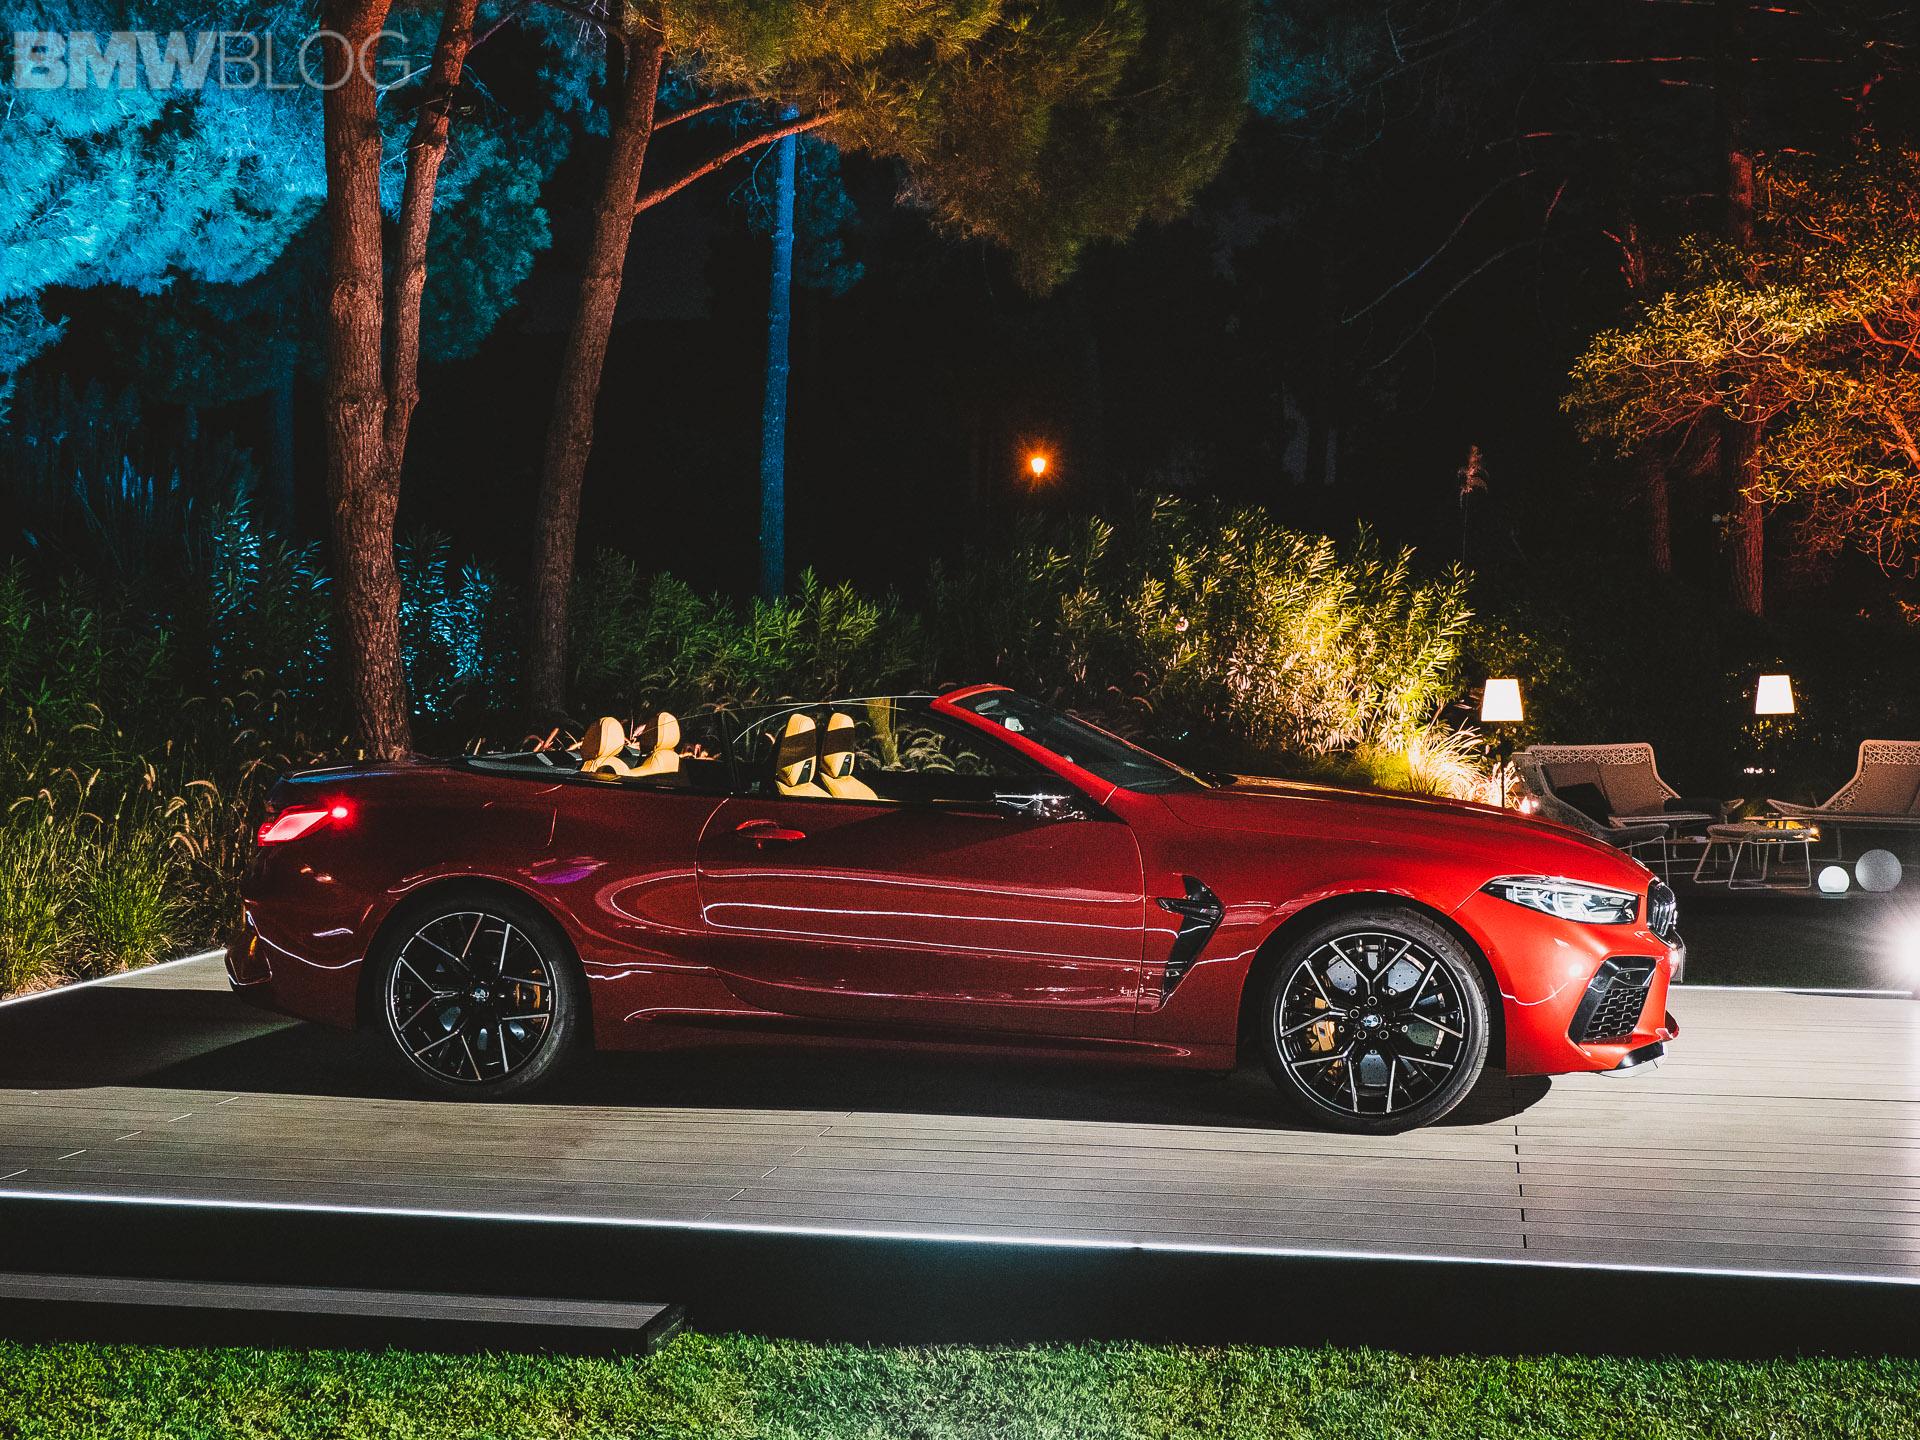 2020 BMW M8 Convertible live photos 3